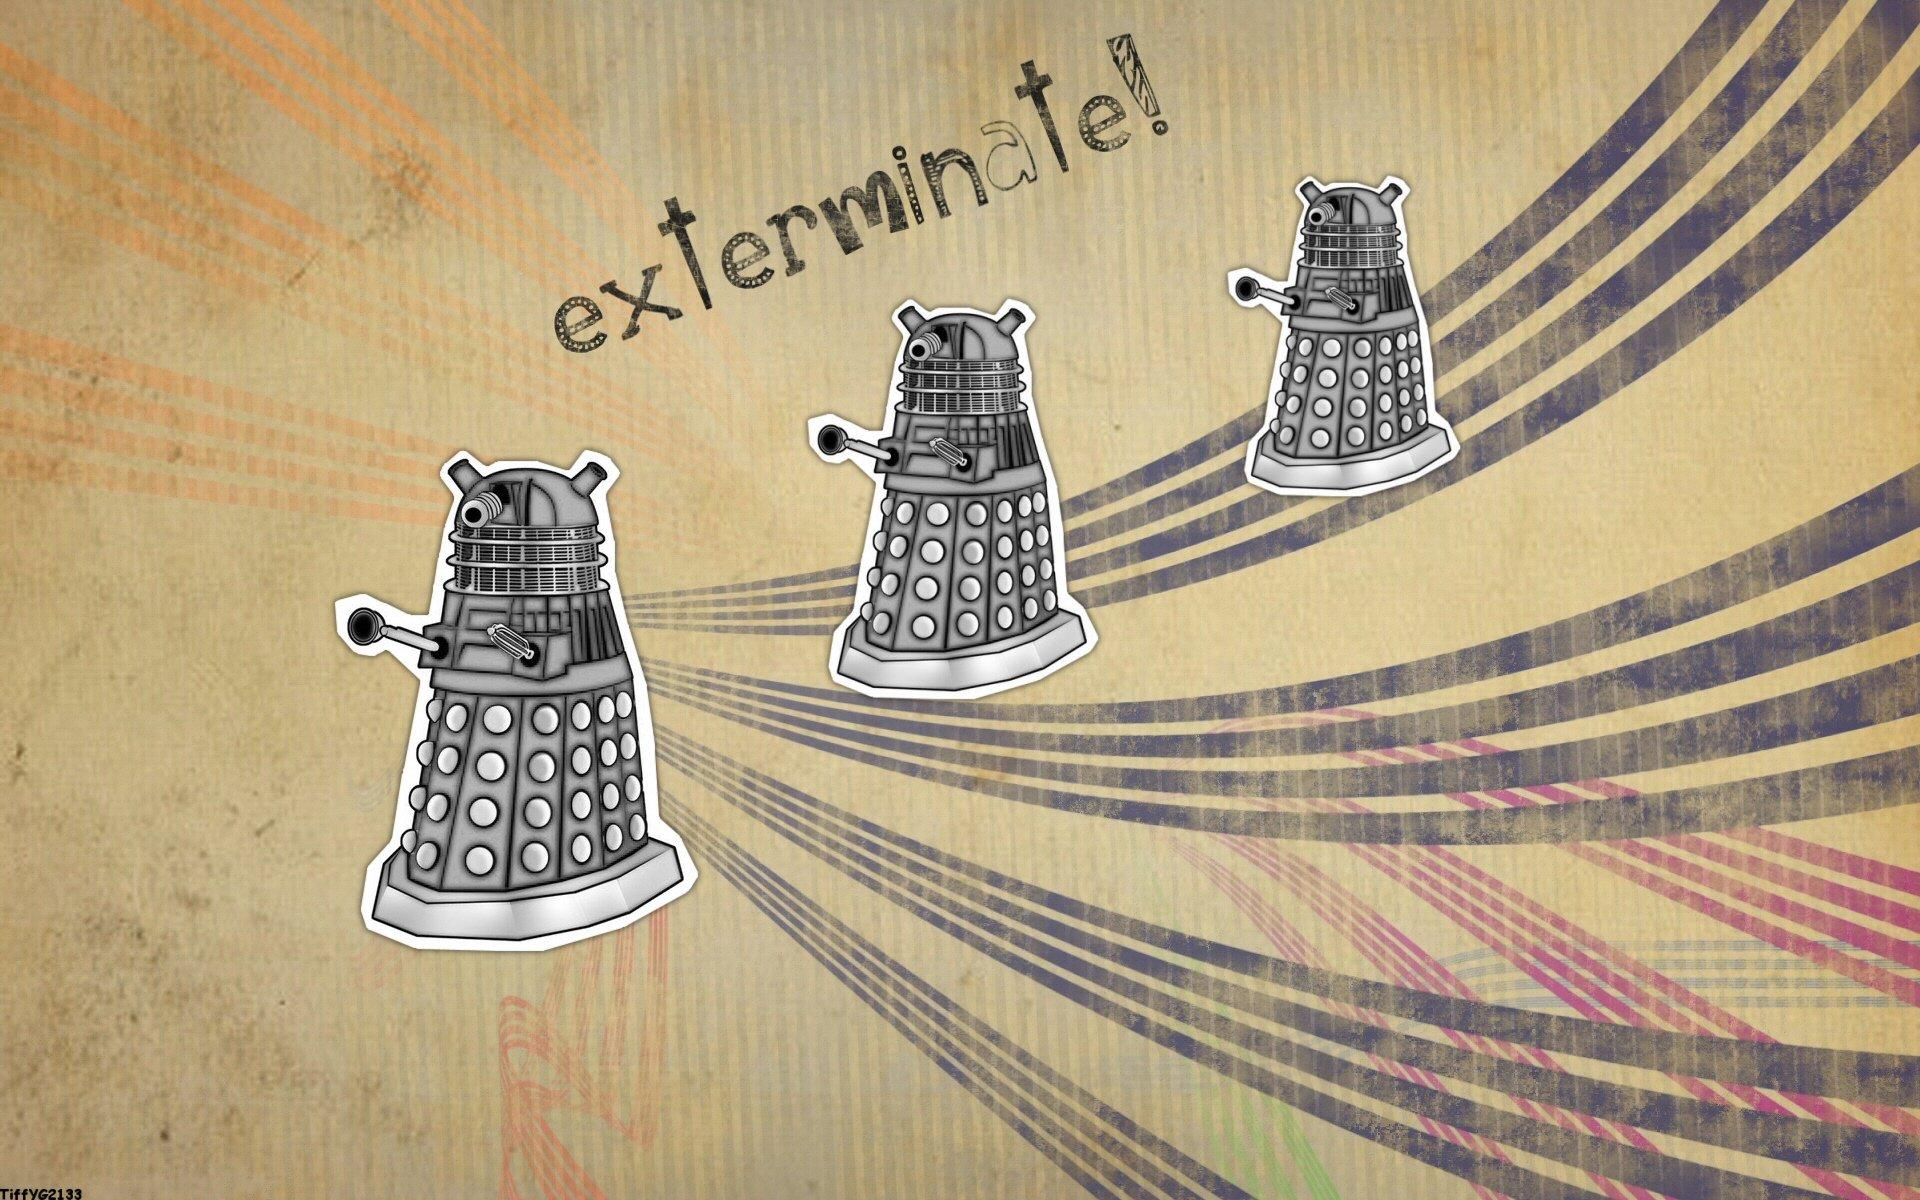 Doctor Who Wallpaper Dalek Wallpaper